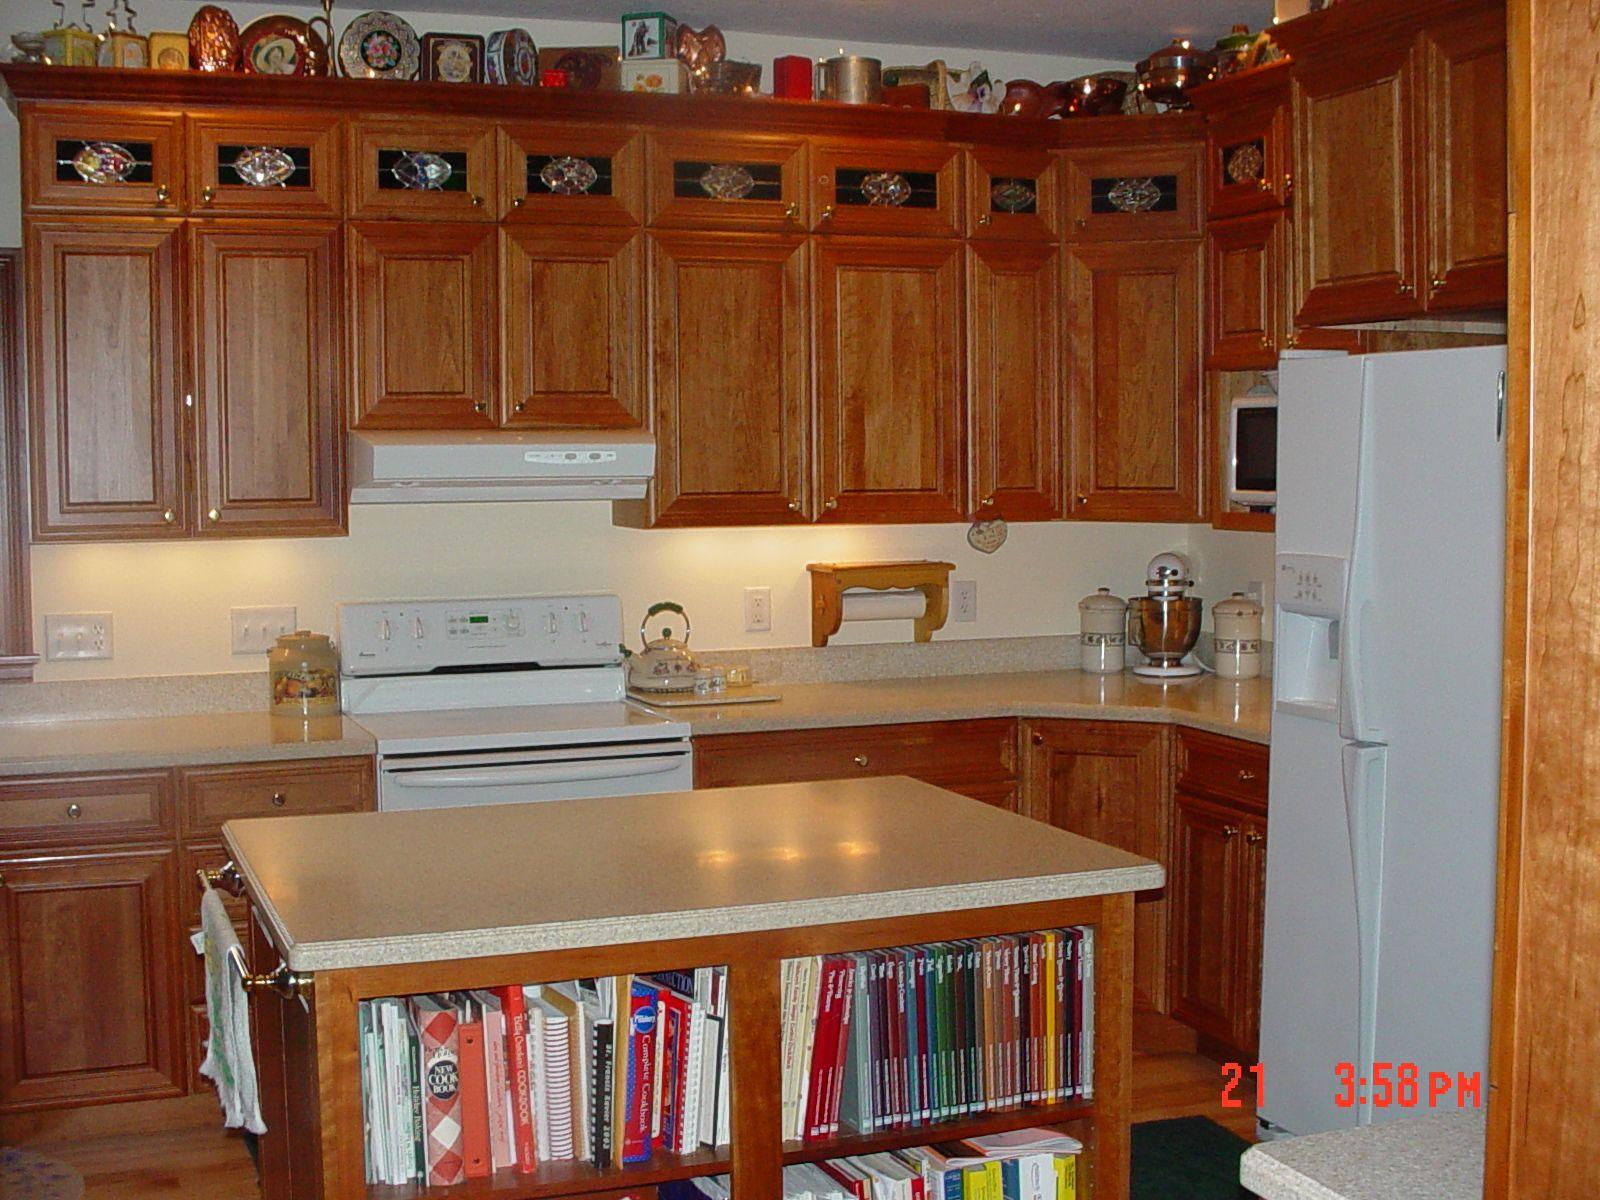 Bertch Custom Stacked Wall Cabinet Kitchen With Bookshelf Island Kitchen Cabinets Kitchen Remodel Kitchen